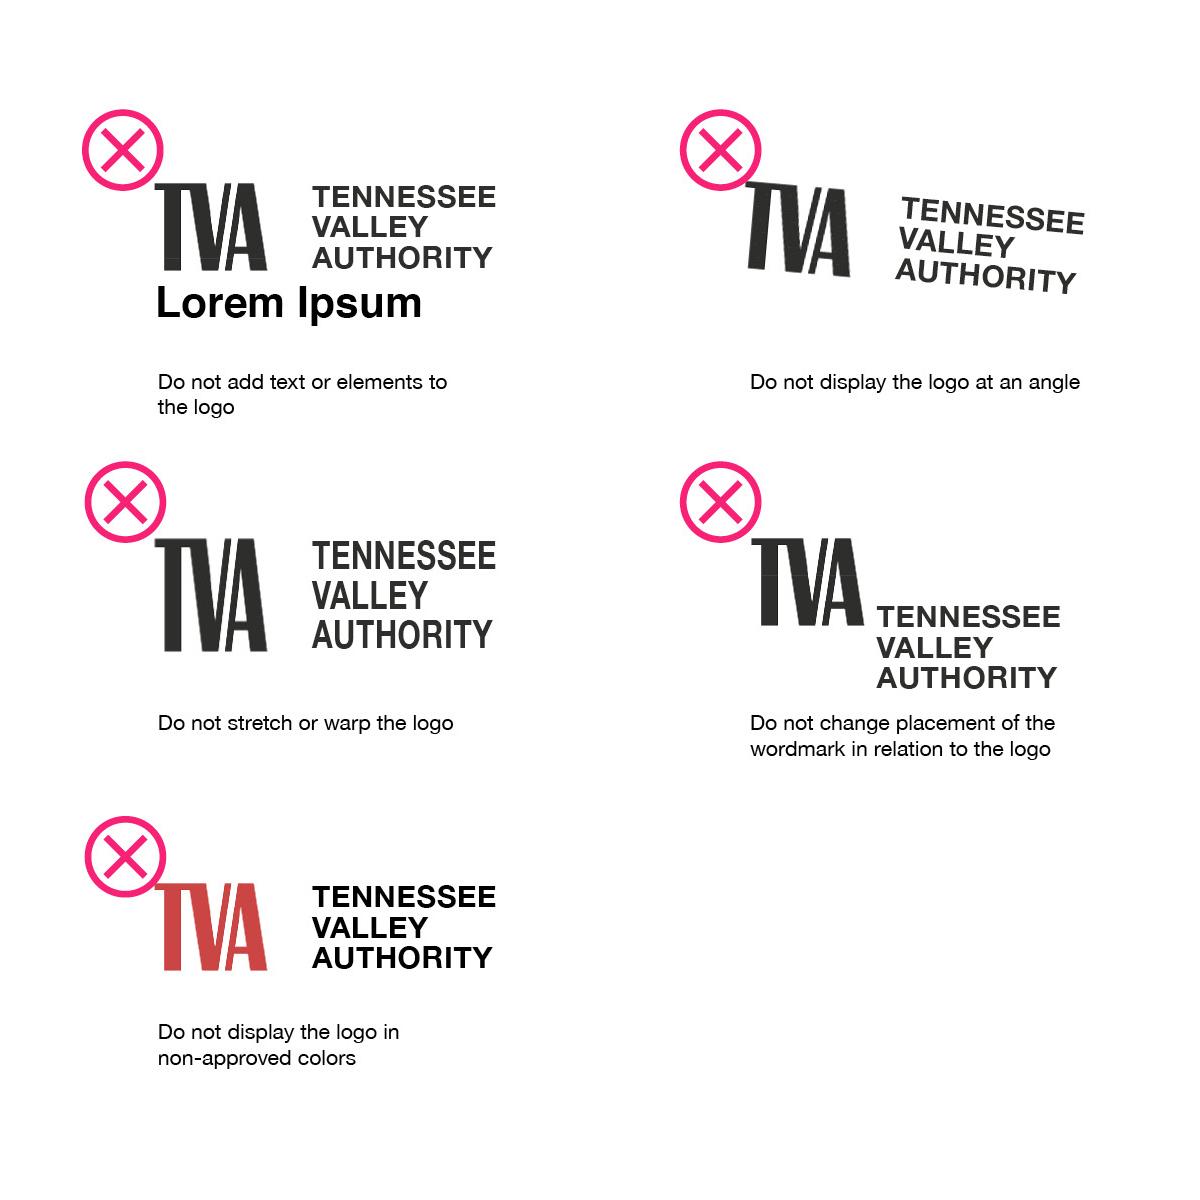 TVA Logo Incorrect Use